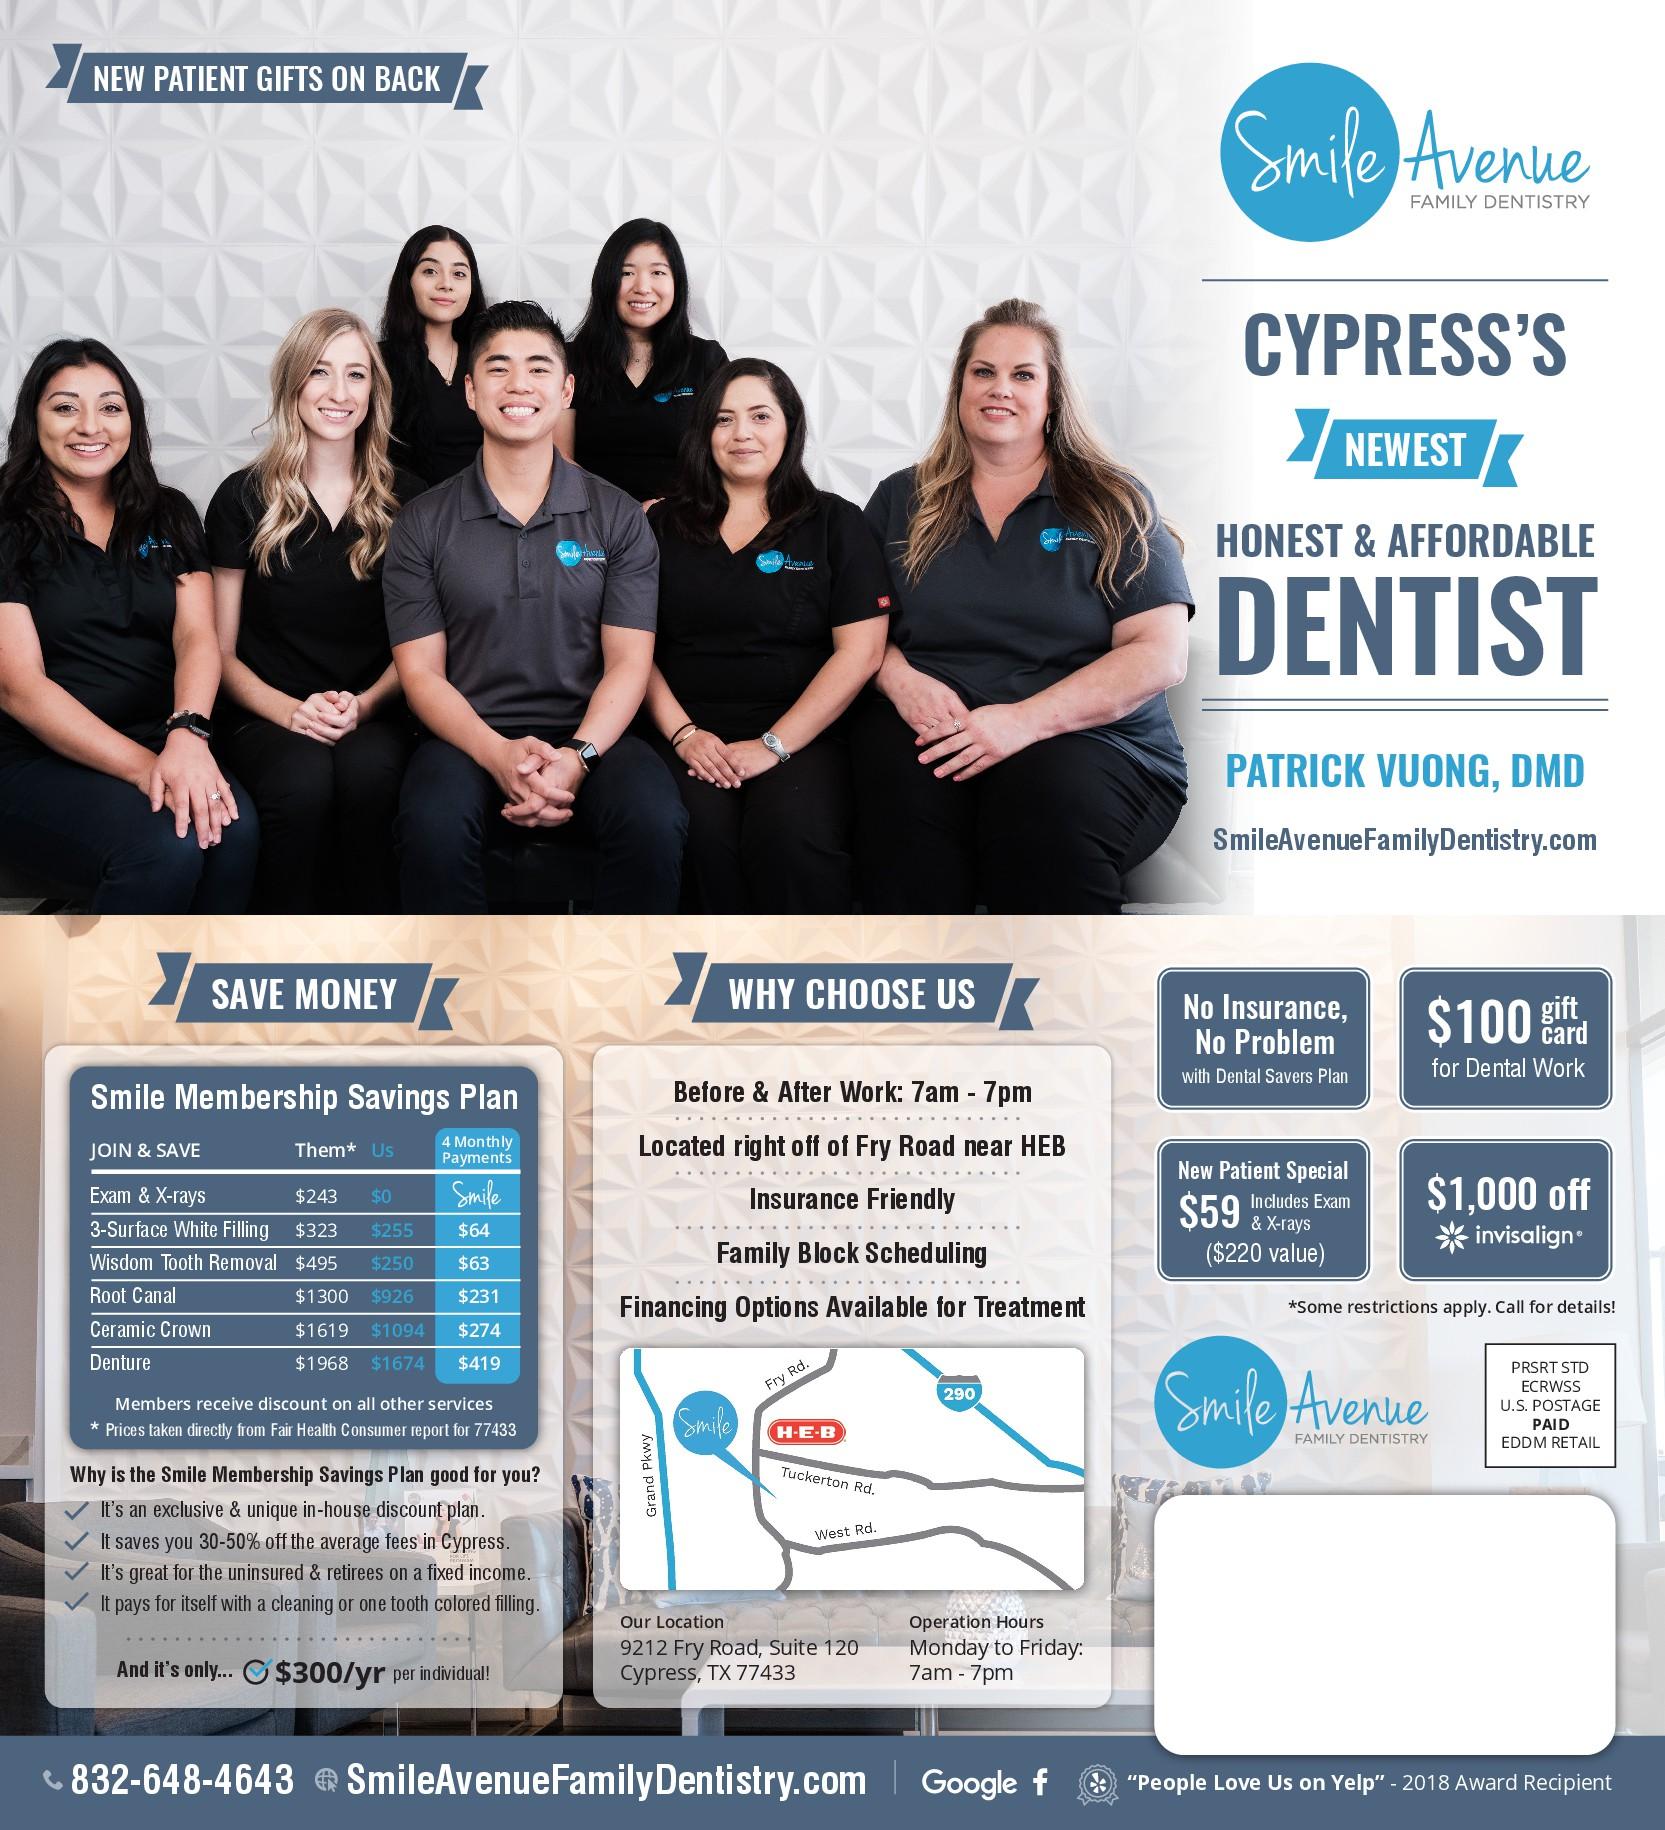 Smile Avenue Family Dentistry: Dental practice Postcard Mailer